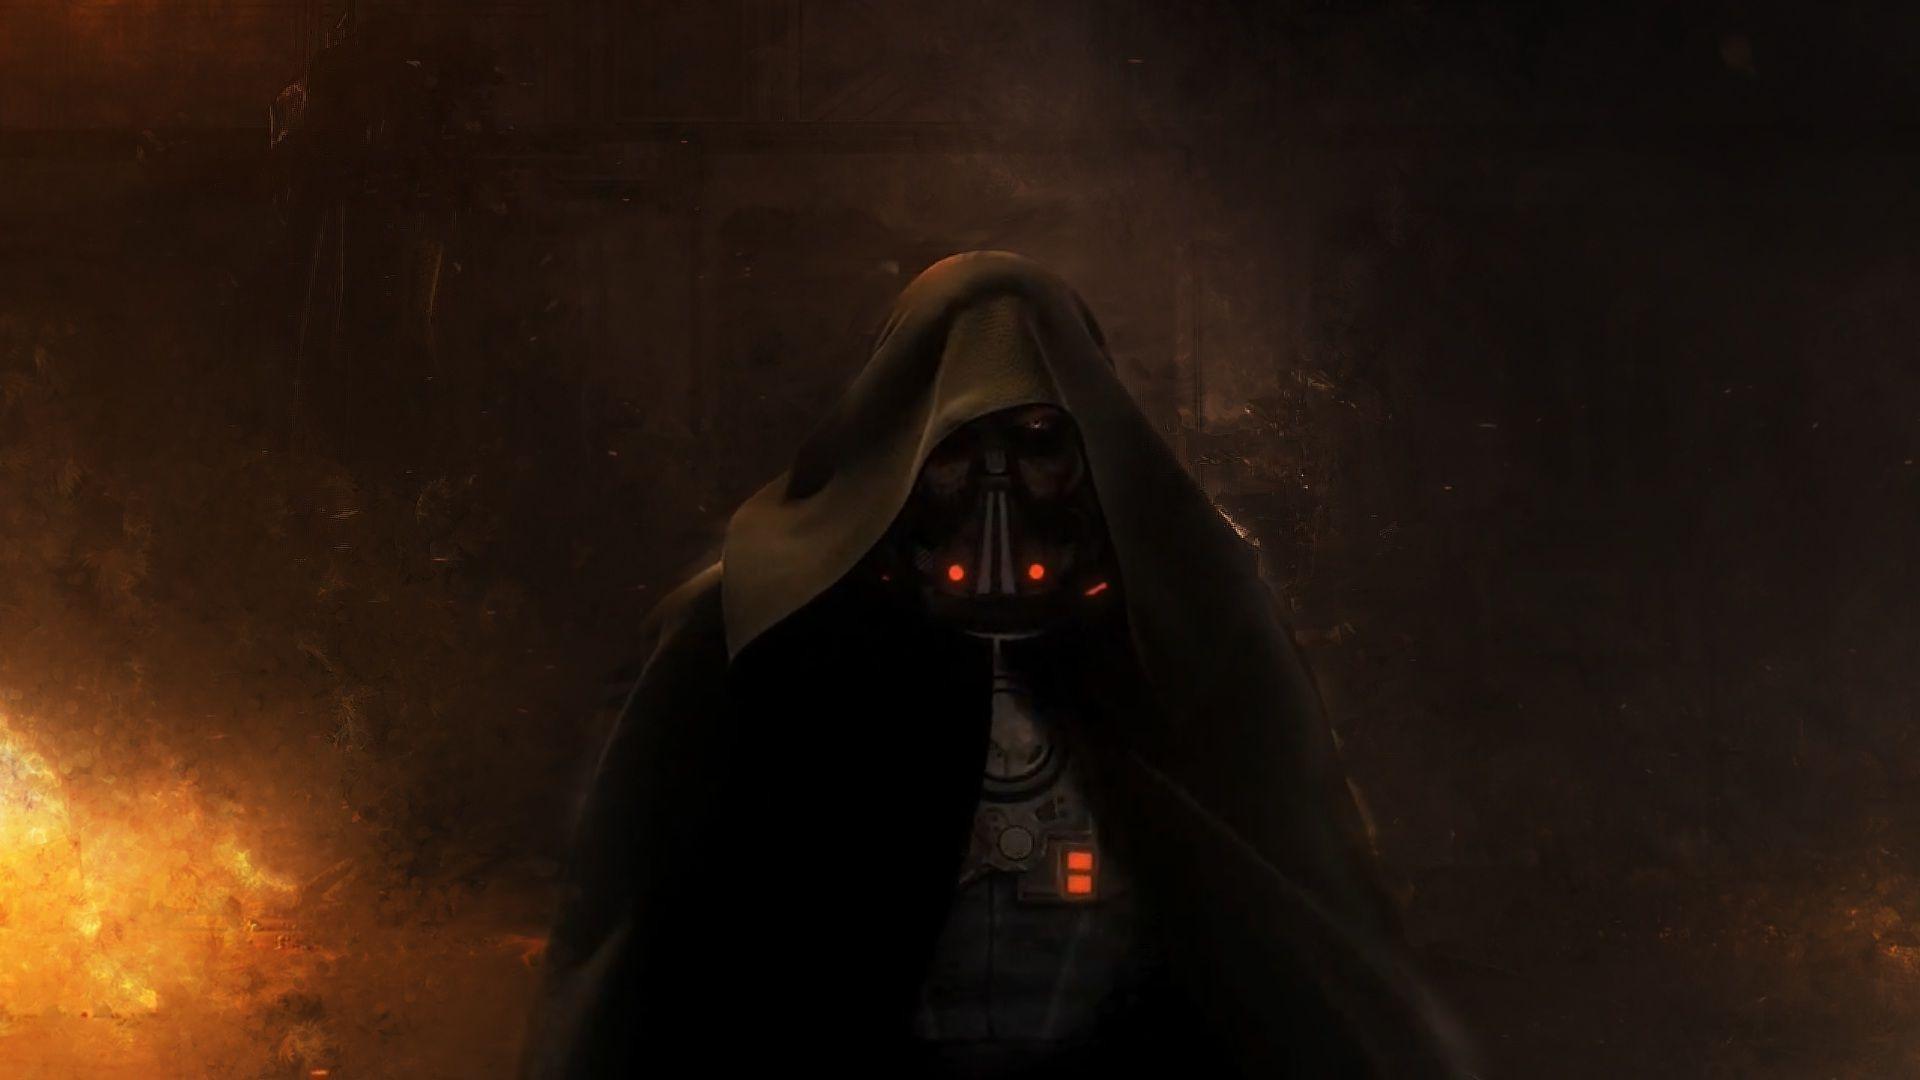 Res: 1920x1080, Sith - Star Wars Wallpaper #